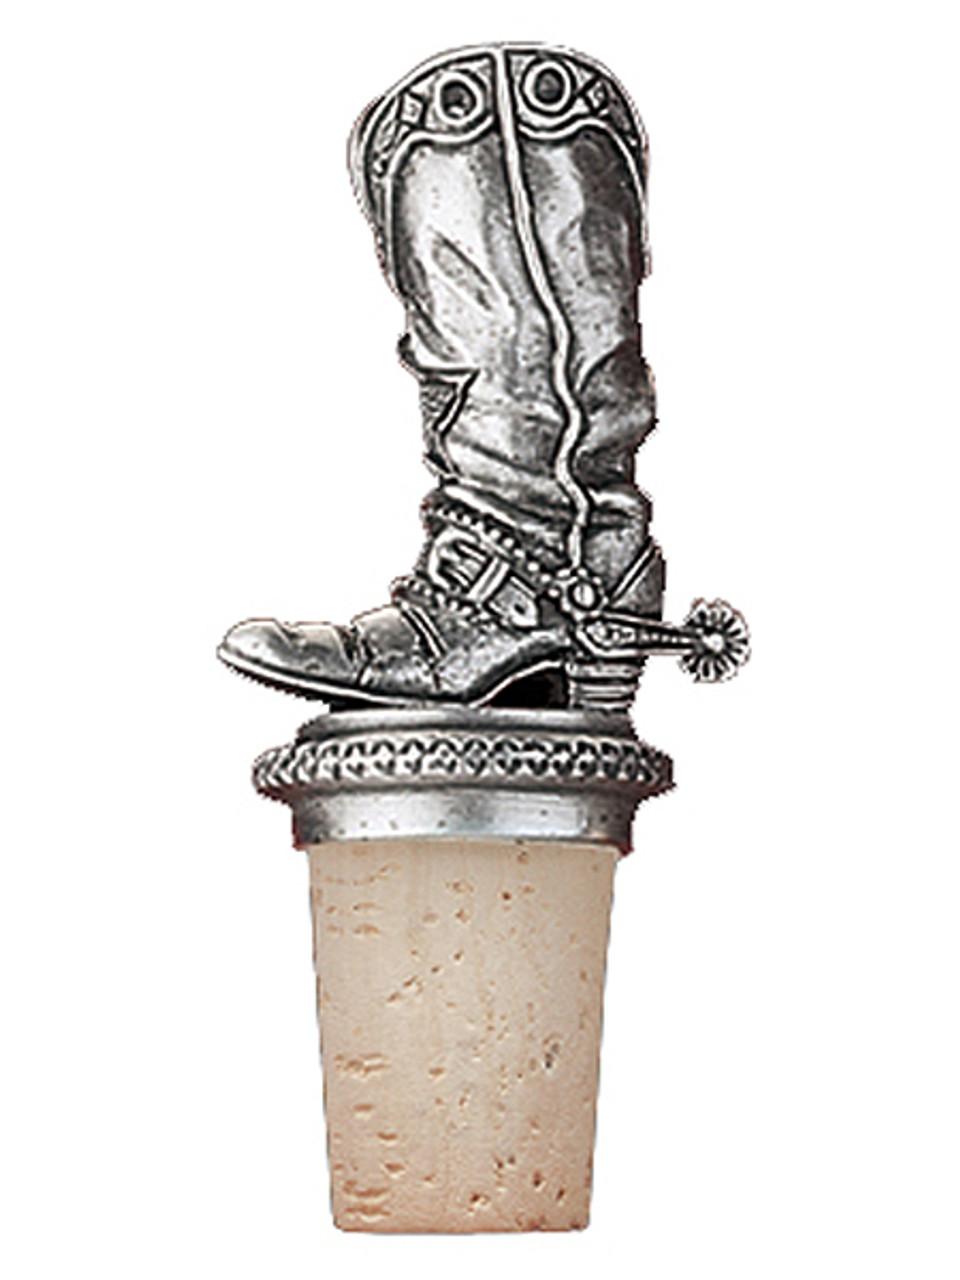 Cowboy Boot Bottle Stopper